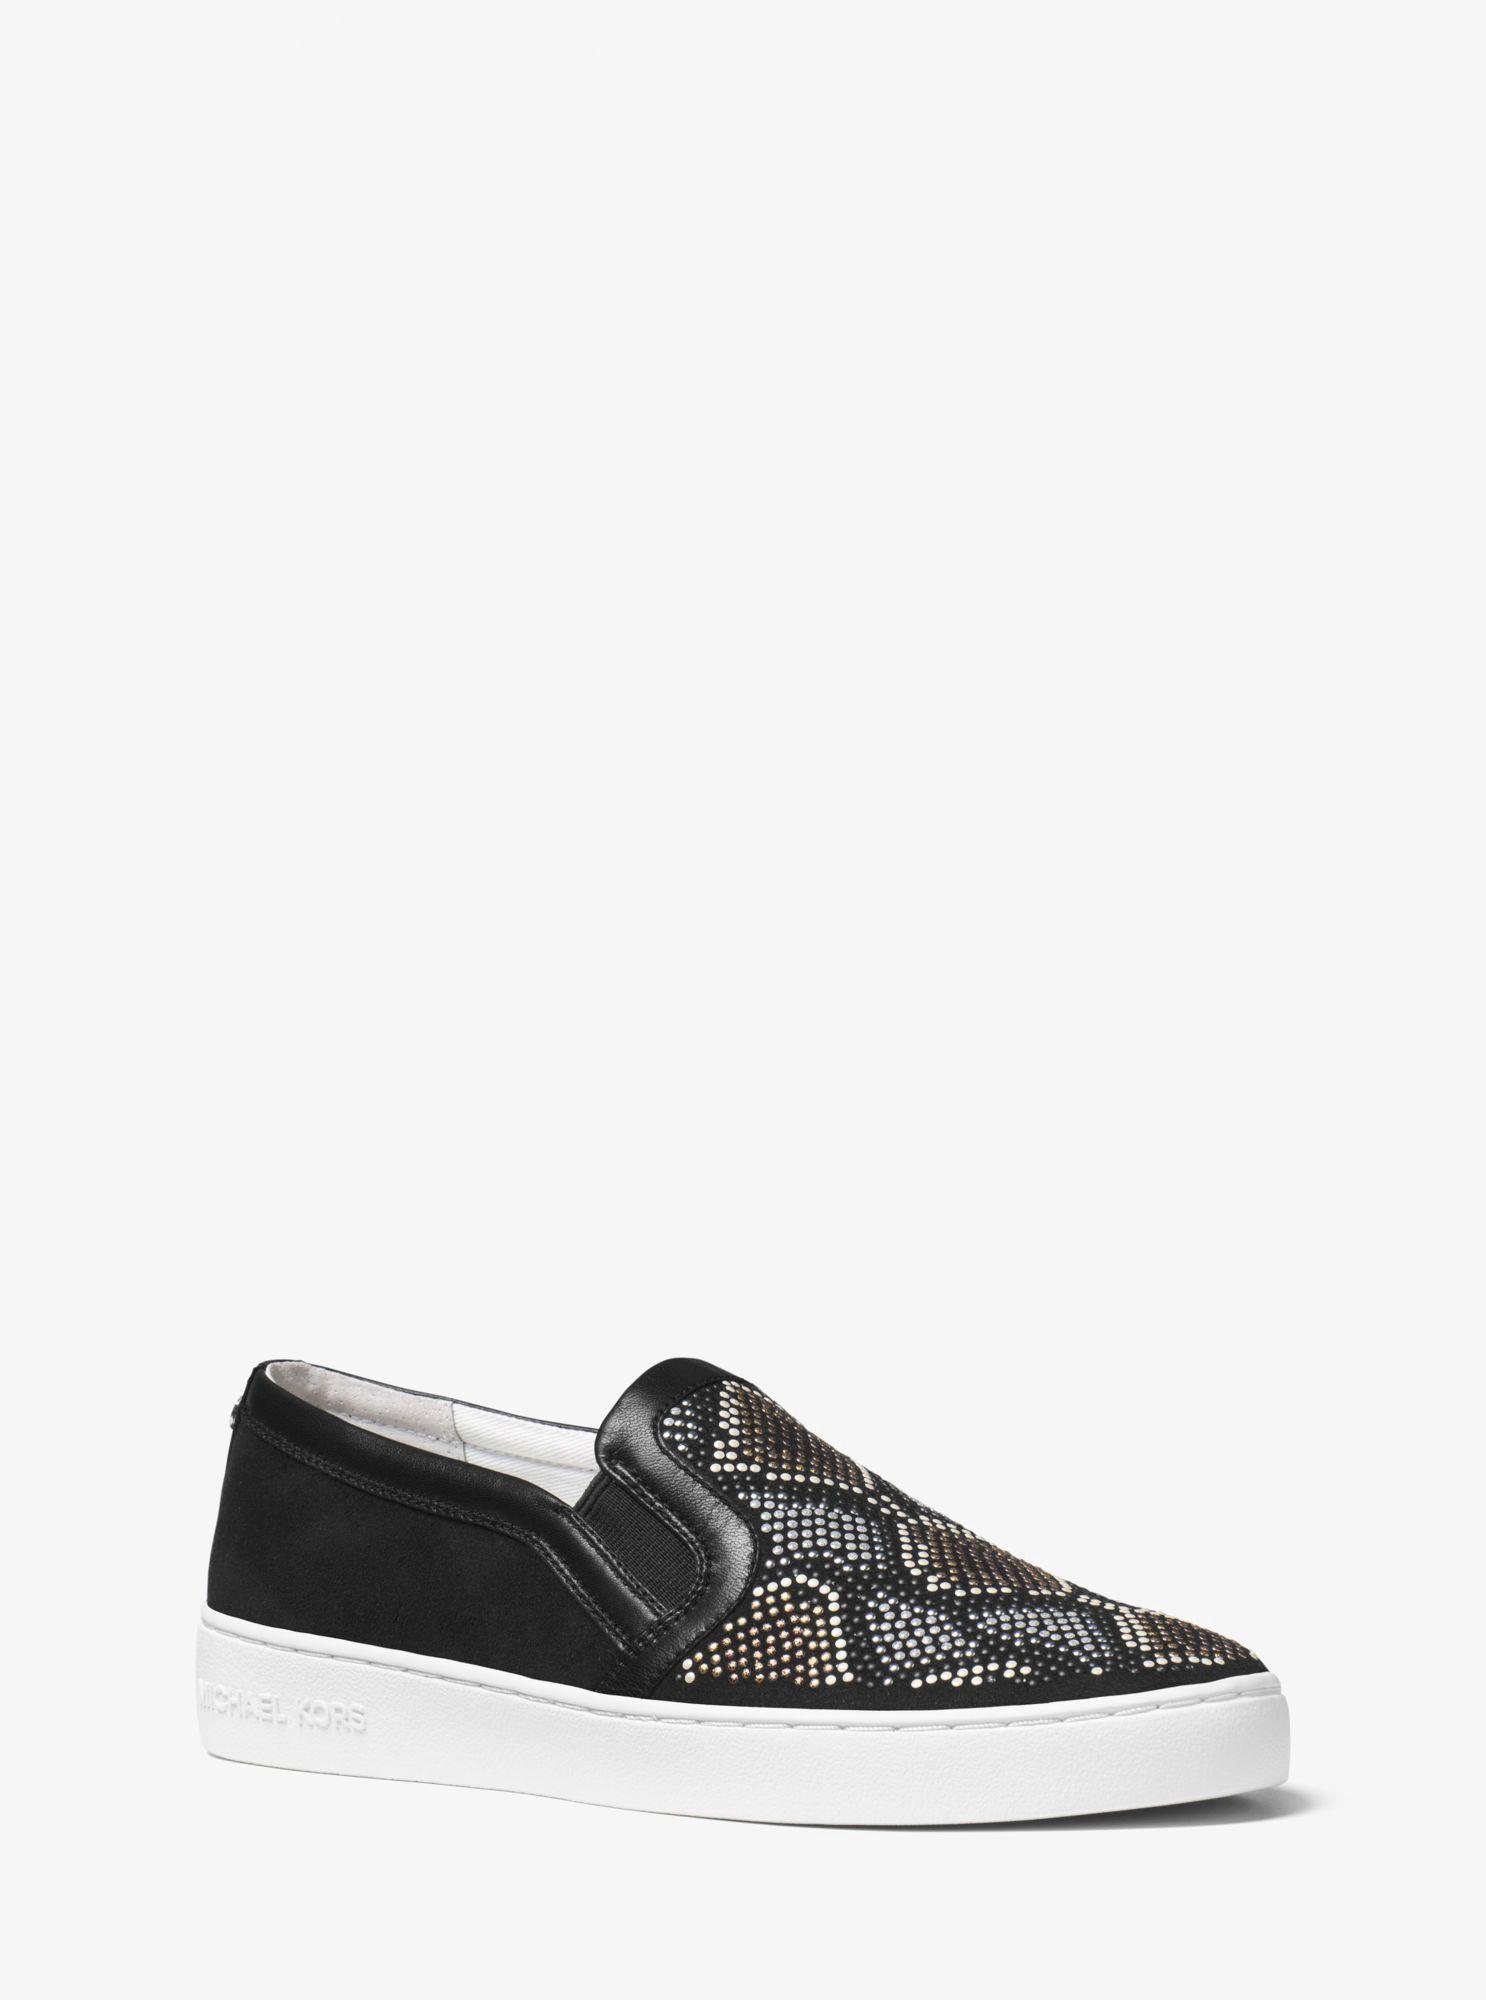 vans classic slip on italian leather all black